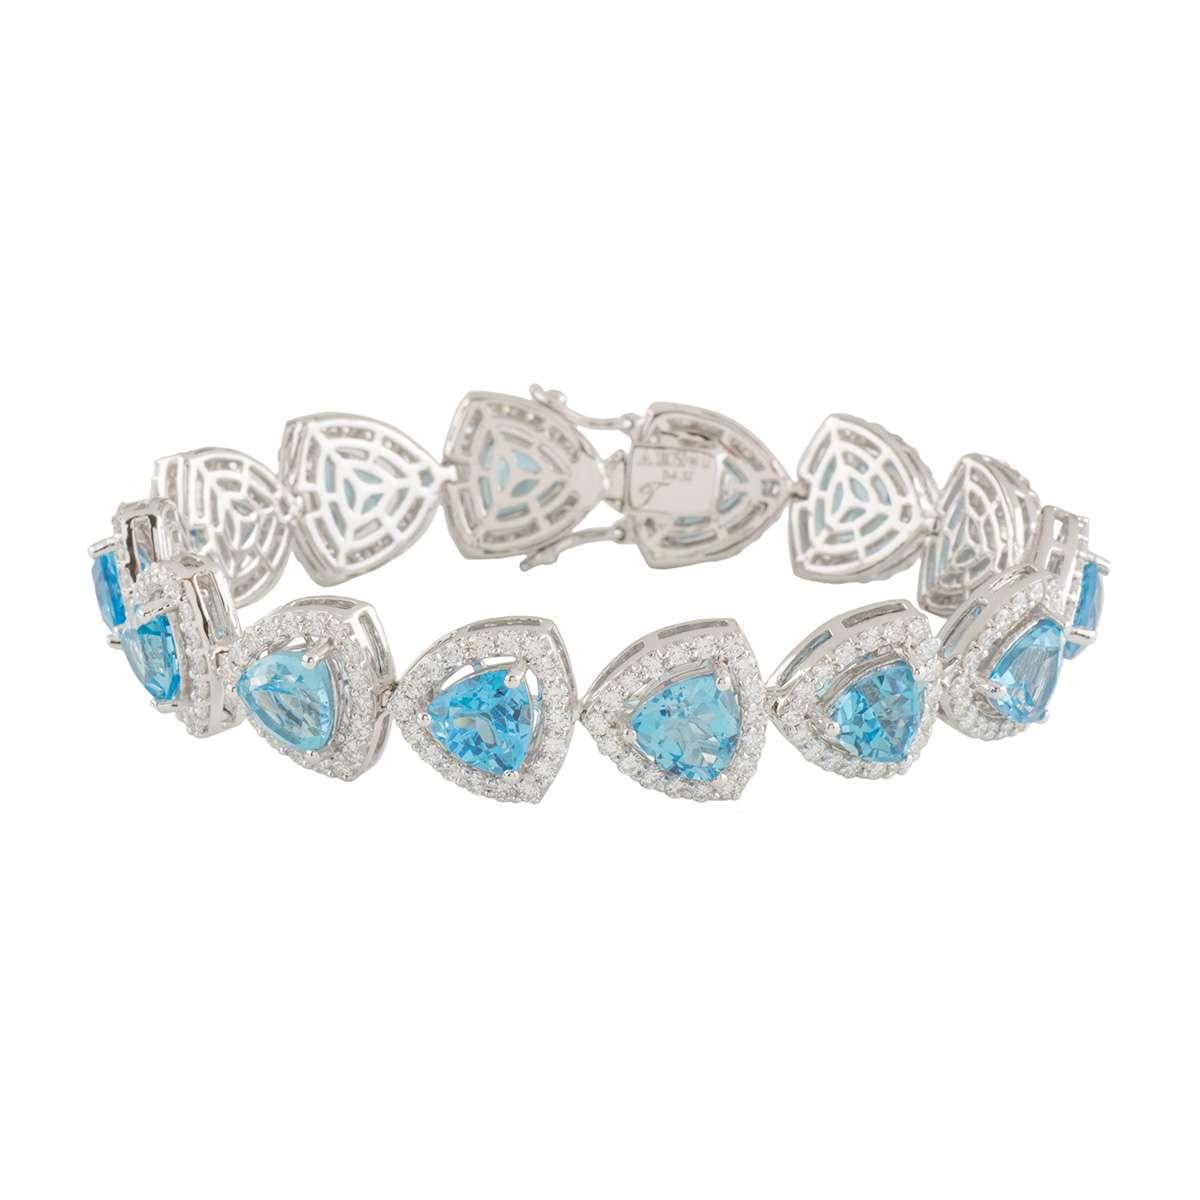 White Gold Topaz and Diamond Bracelet